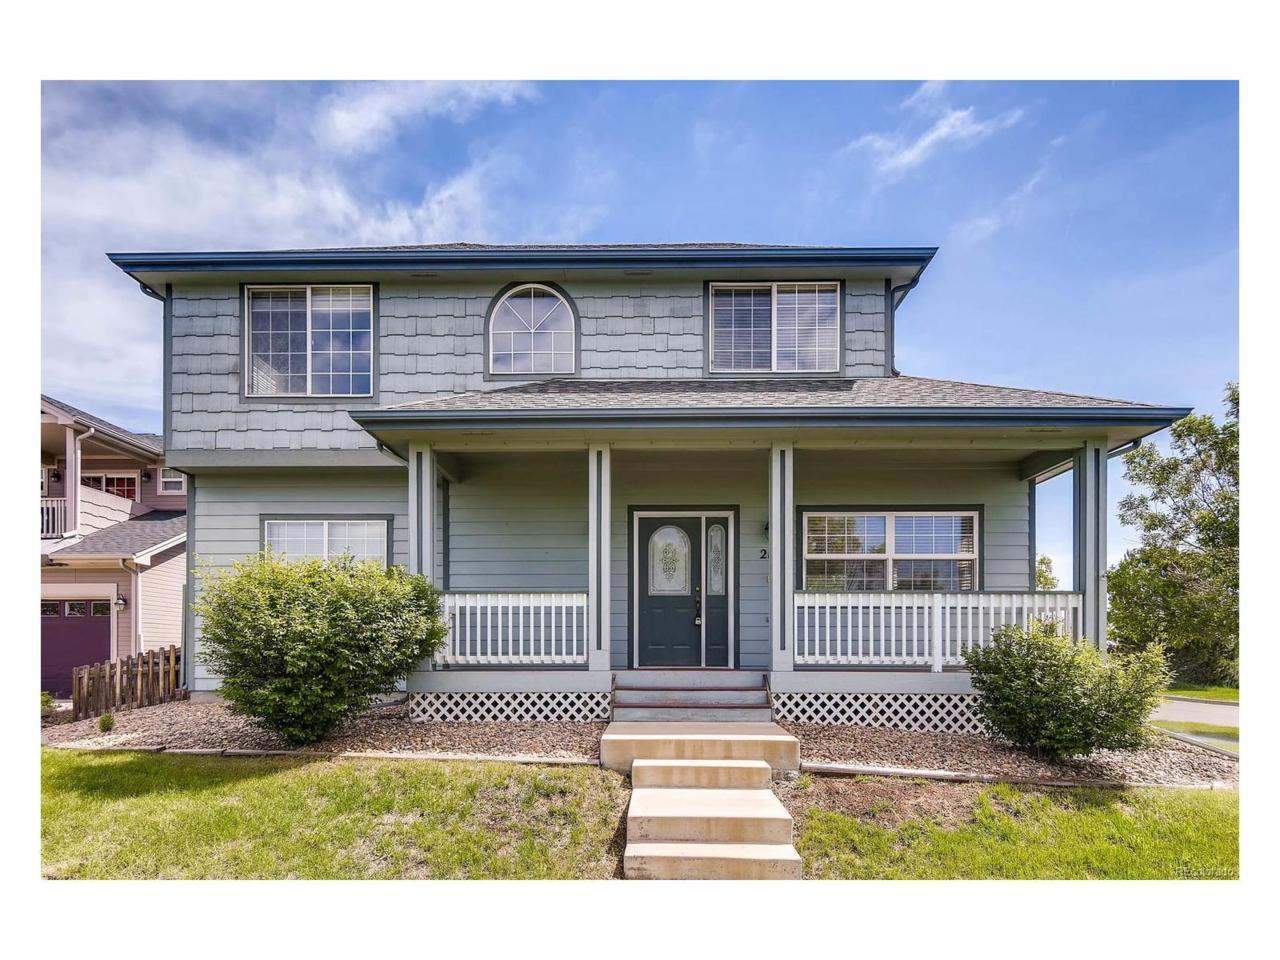 215 Longspur Drive, Brighton, CO 80601 (MLS #8872744) :: 8z Real Estate